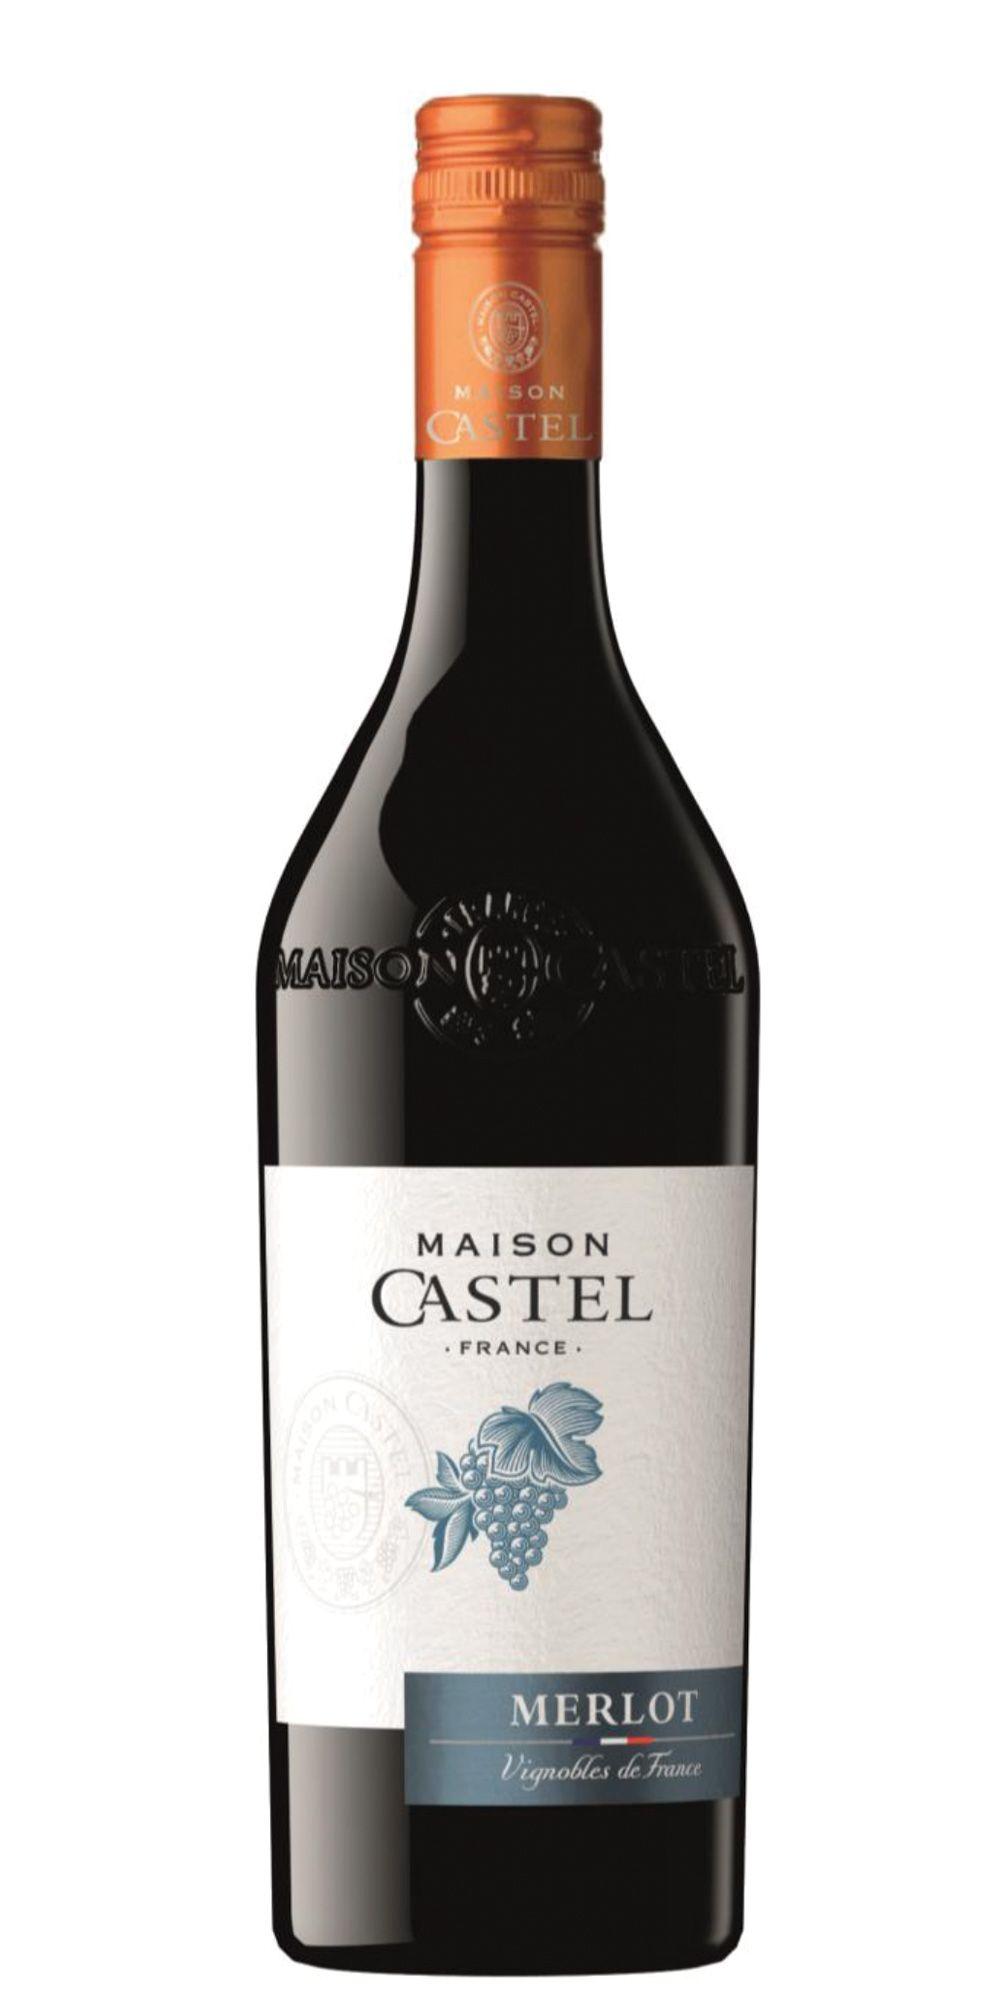 Vinho Francês Maison Castel Merlot  2015(750ml)